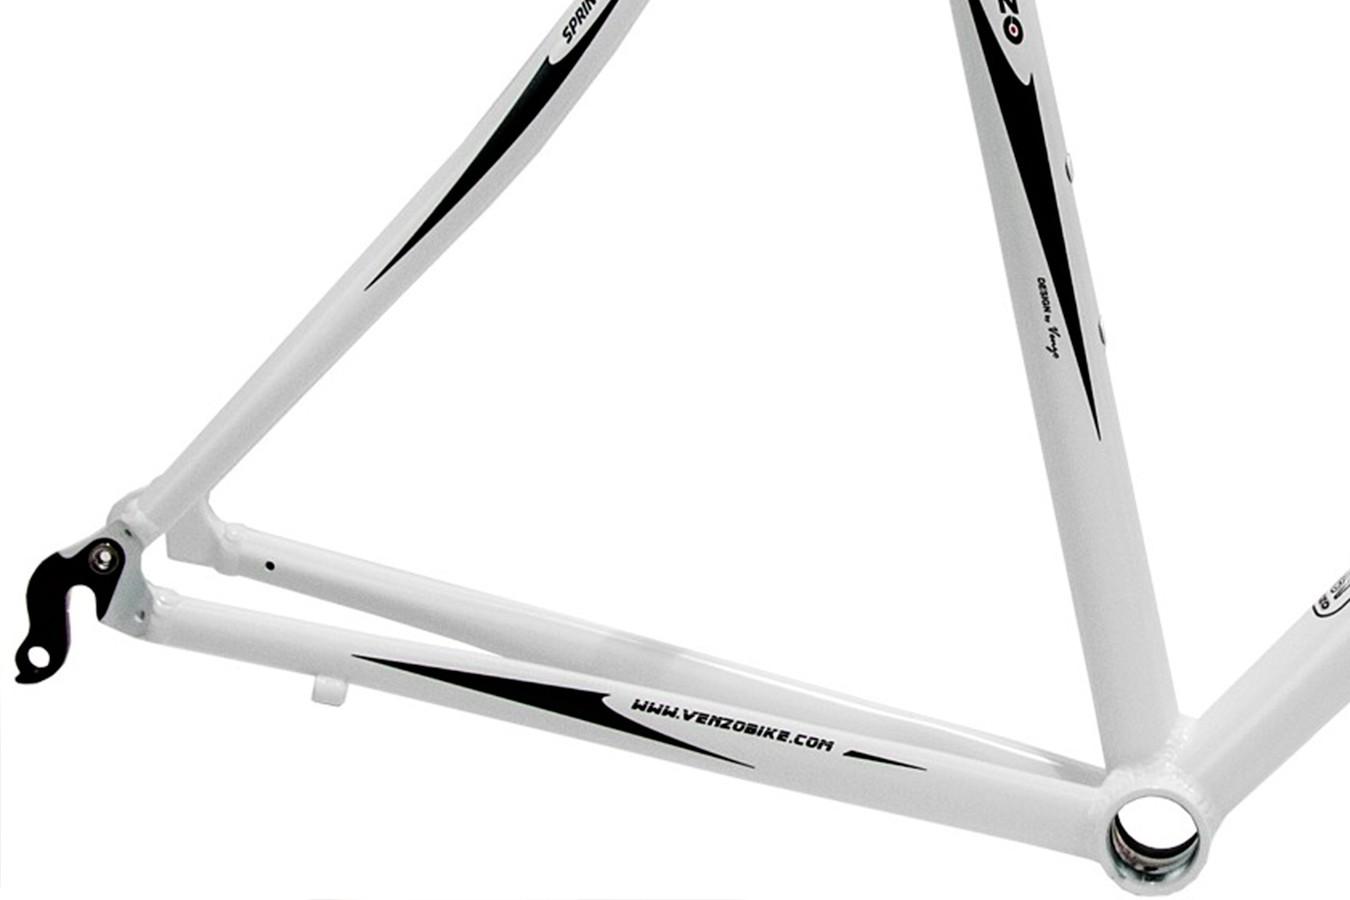 Quadro/Garfo 700 Sprinter R3 Alumínio - Venzo